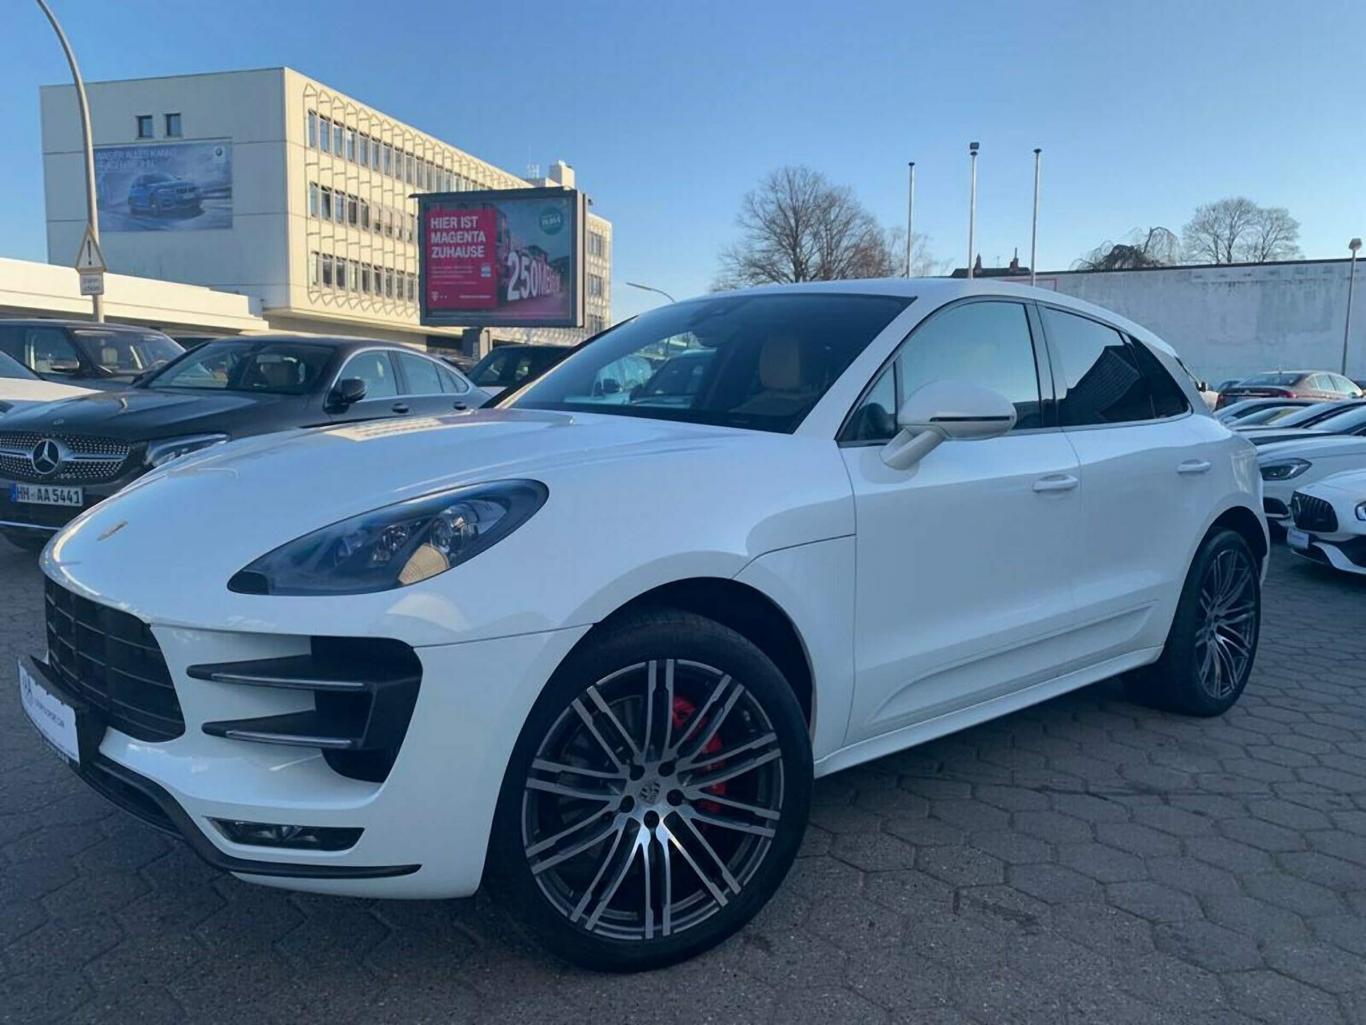 Porsche Macan Turbo >> Porsche Macan Turbo Panorama